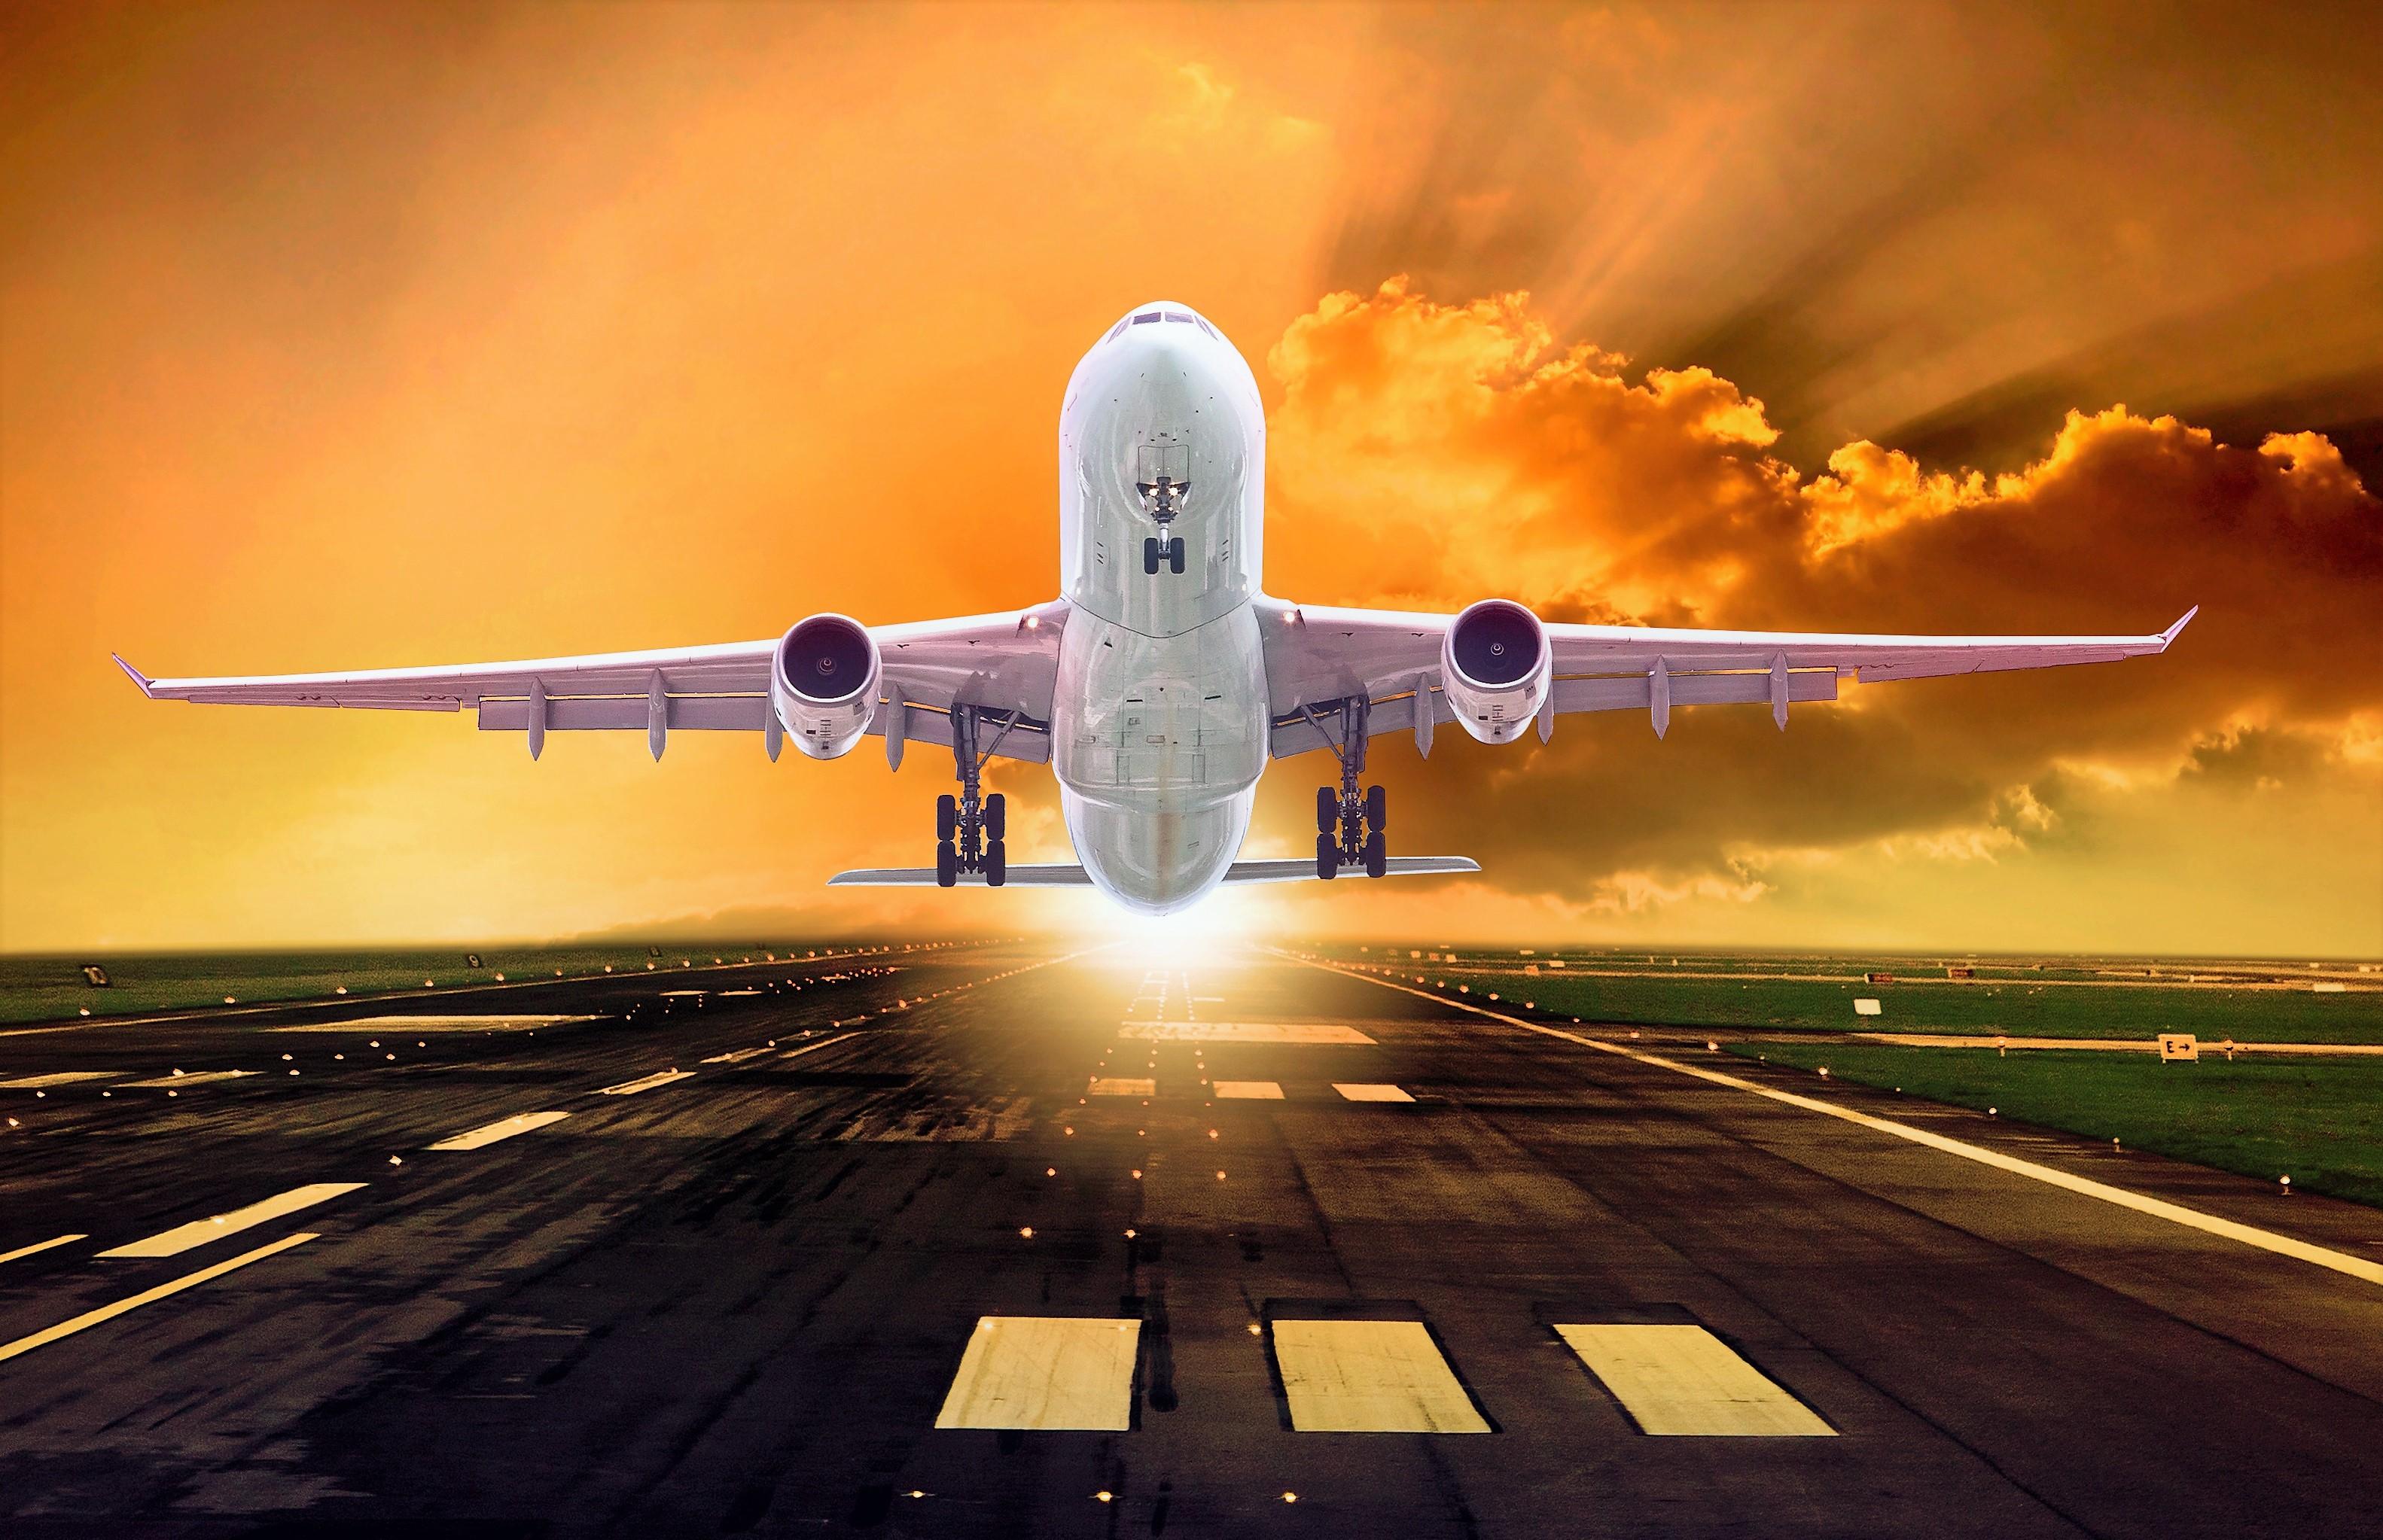 Artistic Airplane Sky Sunset Orange Color Passenger Plane 3165x2046